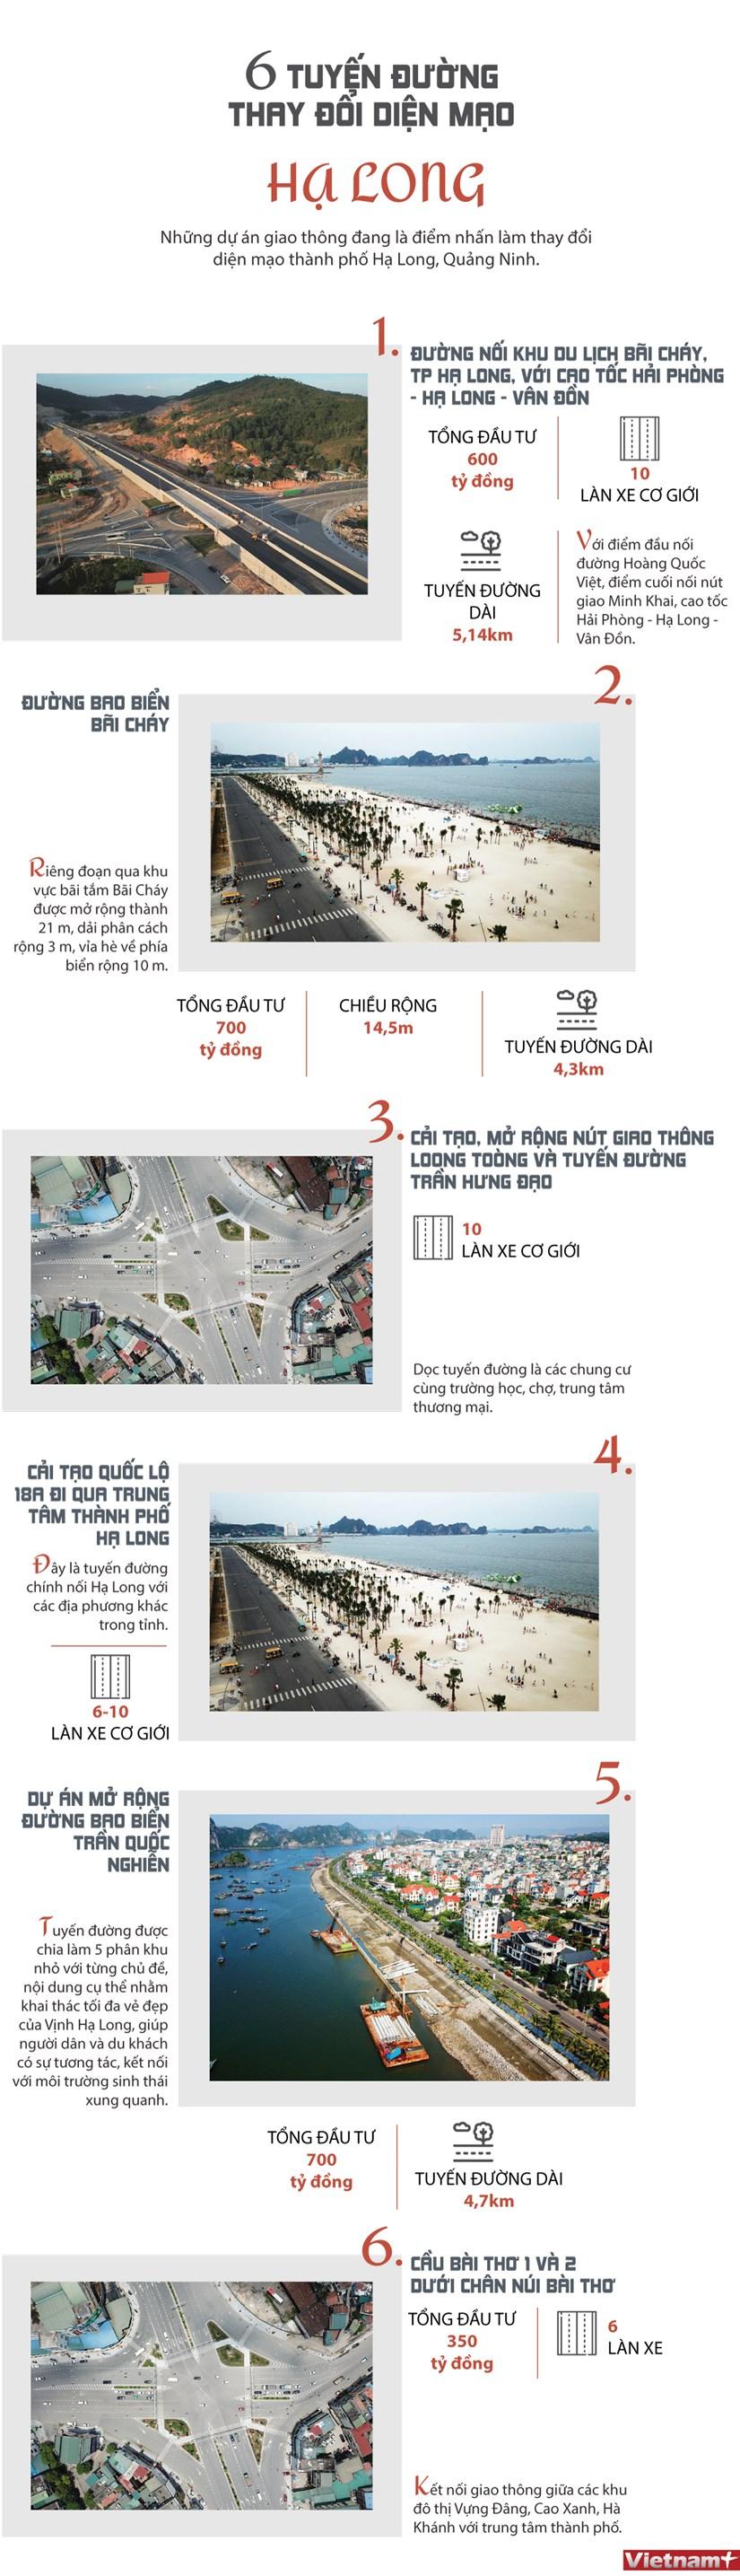 [Infographics] 6 tuyen duong lam thay doi dien mao Ha Long hinh anh 1